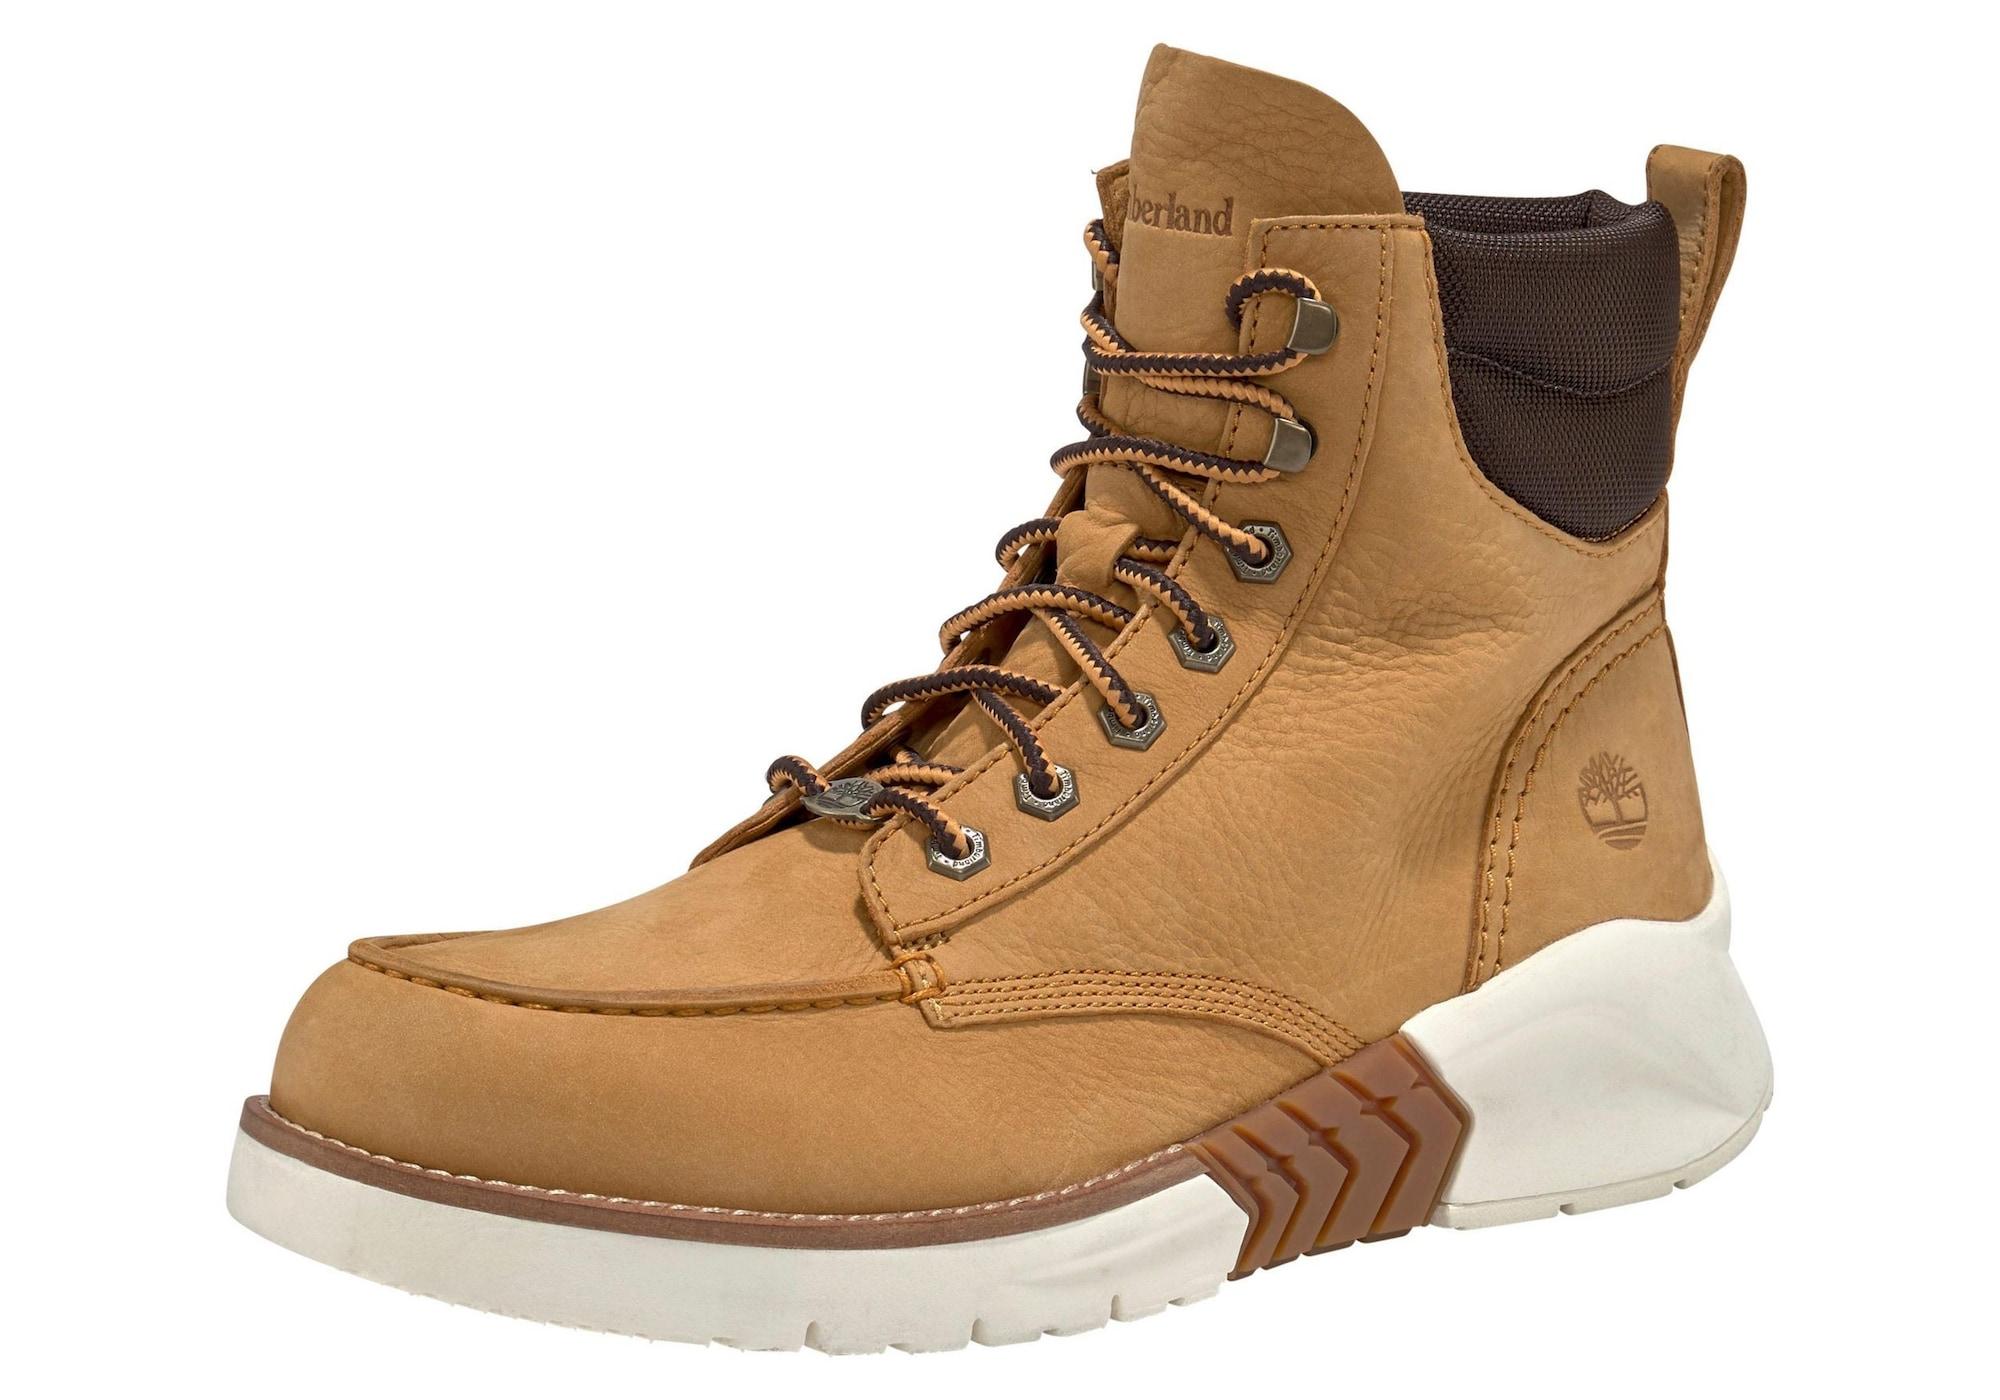 Herren Timberland Bootsschuh 'MTCR Moc Toe Boot' camel,  sand | 00192364599587